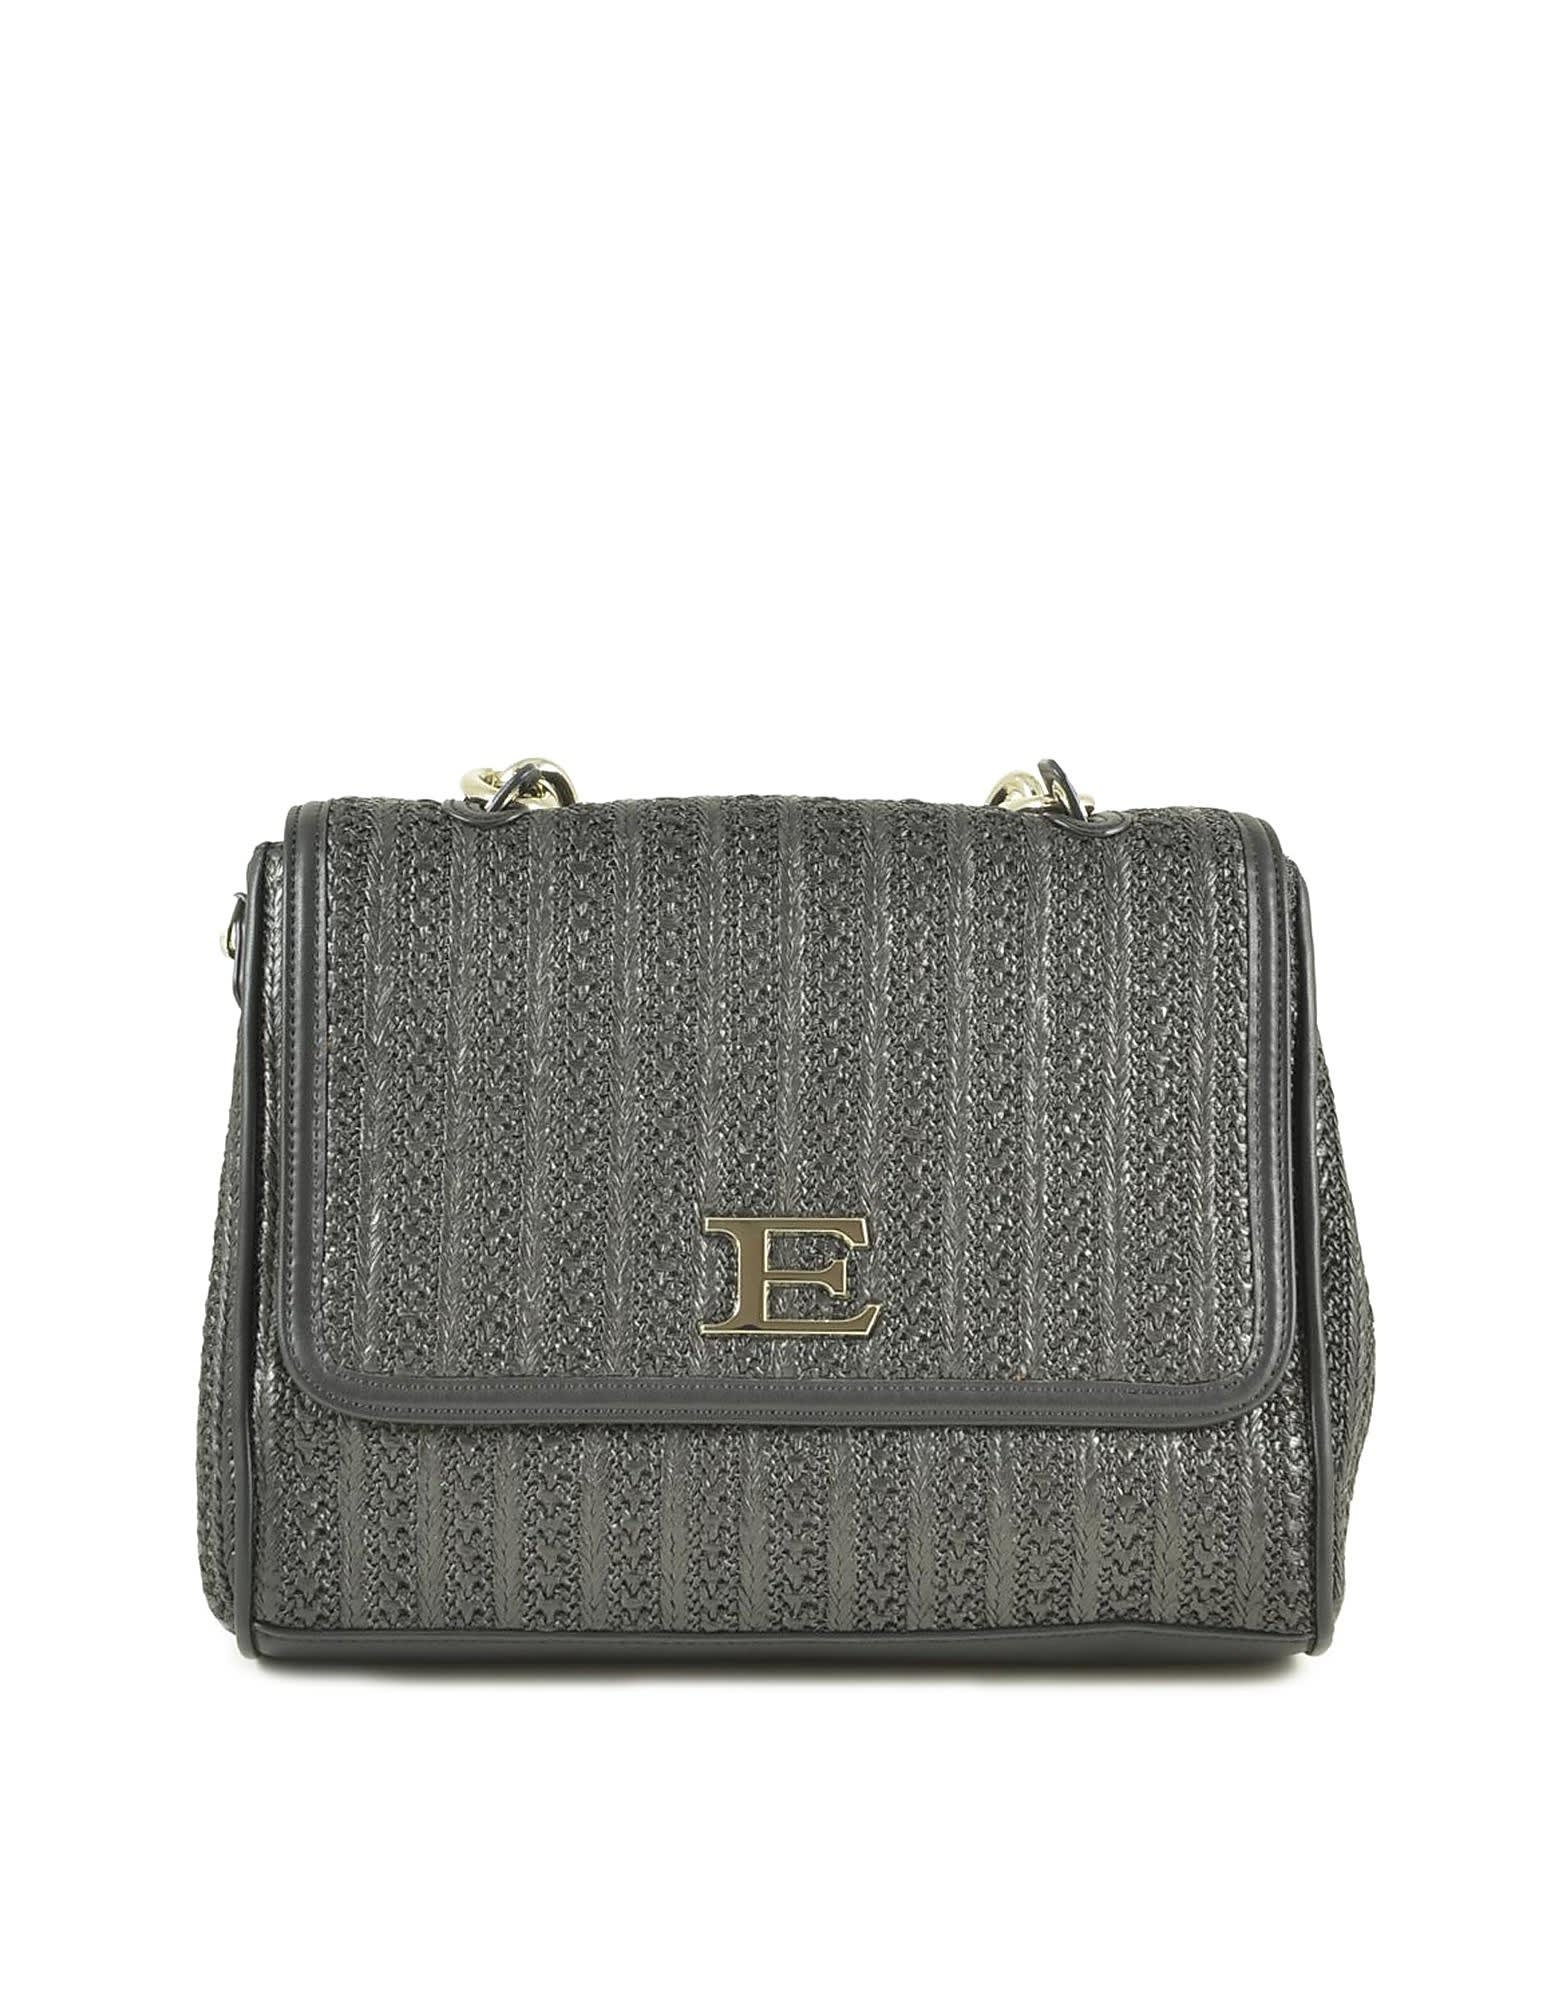 Ermanno Scervino Black Woven Fabric Gloria Small Flap Shoulder Bag